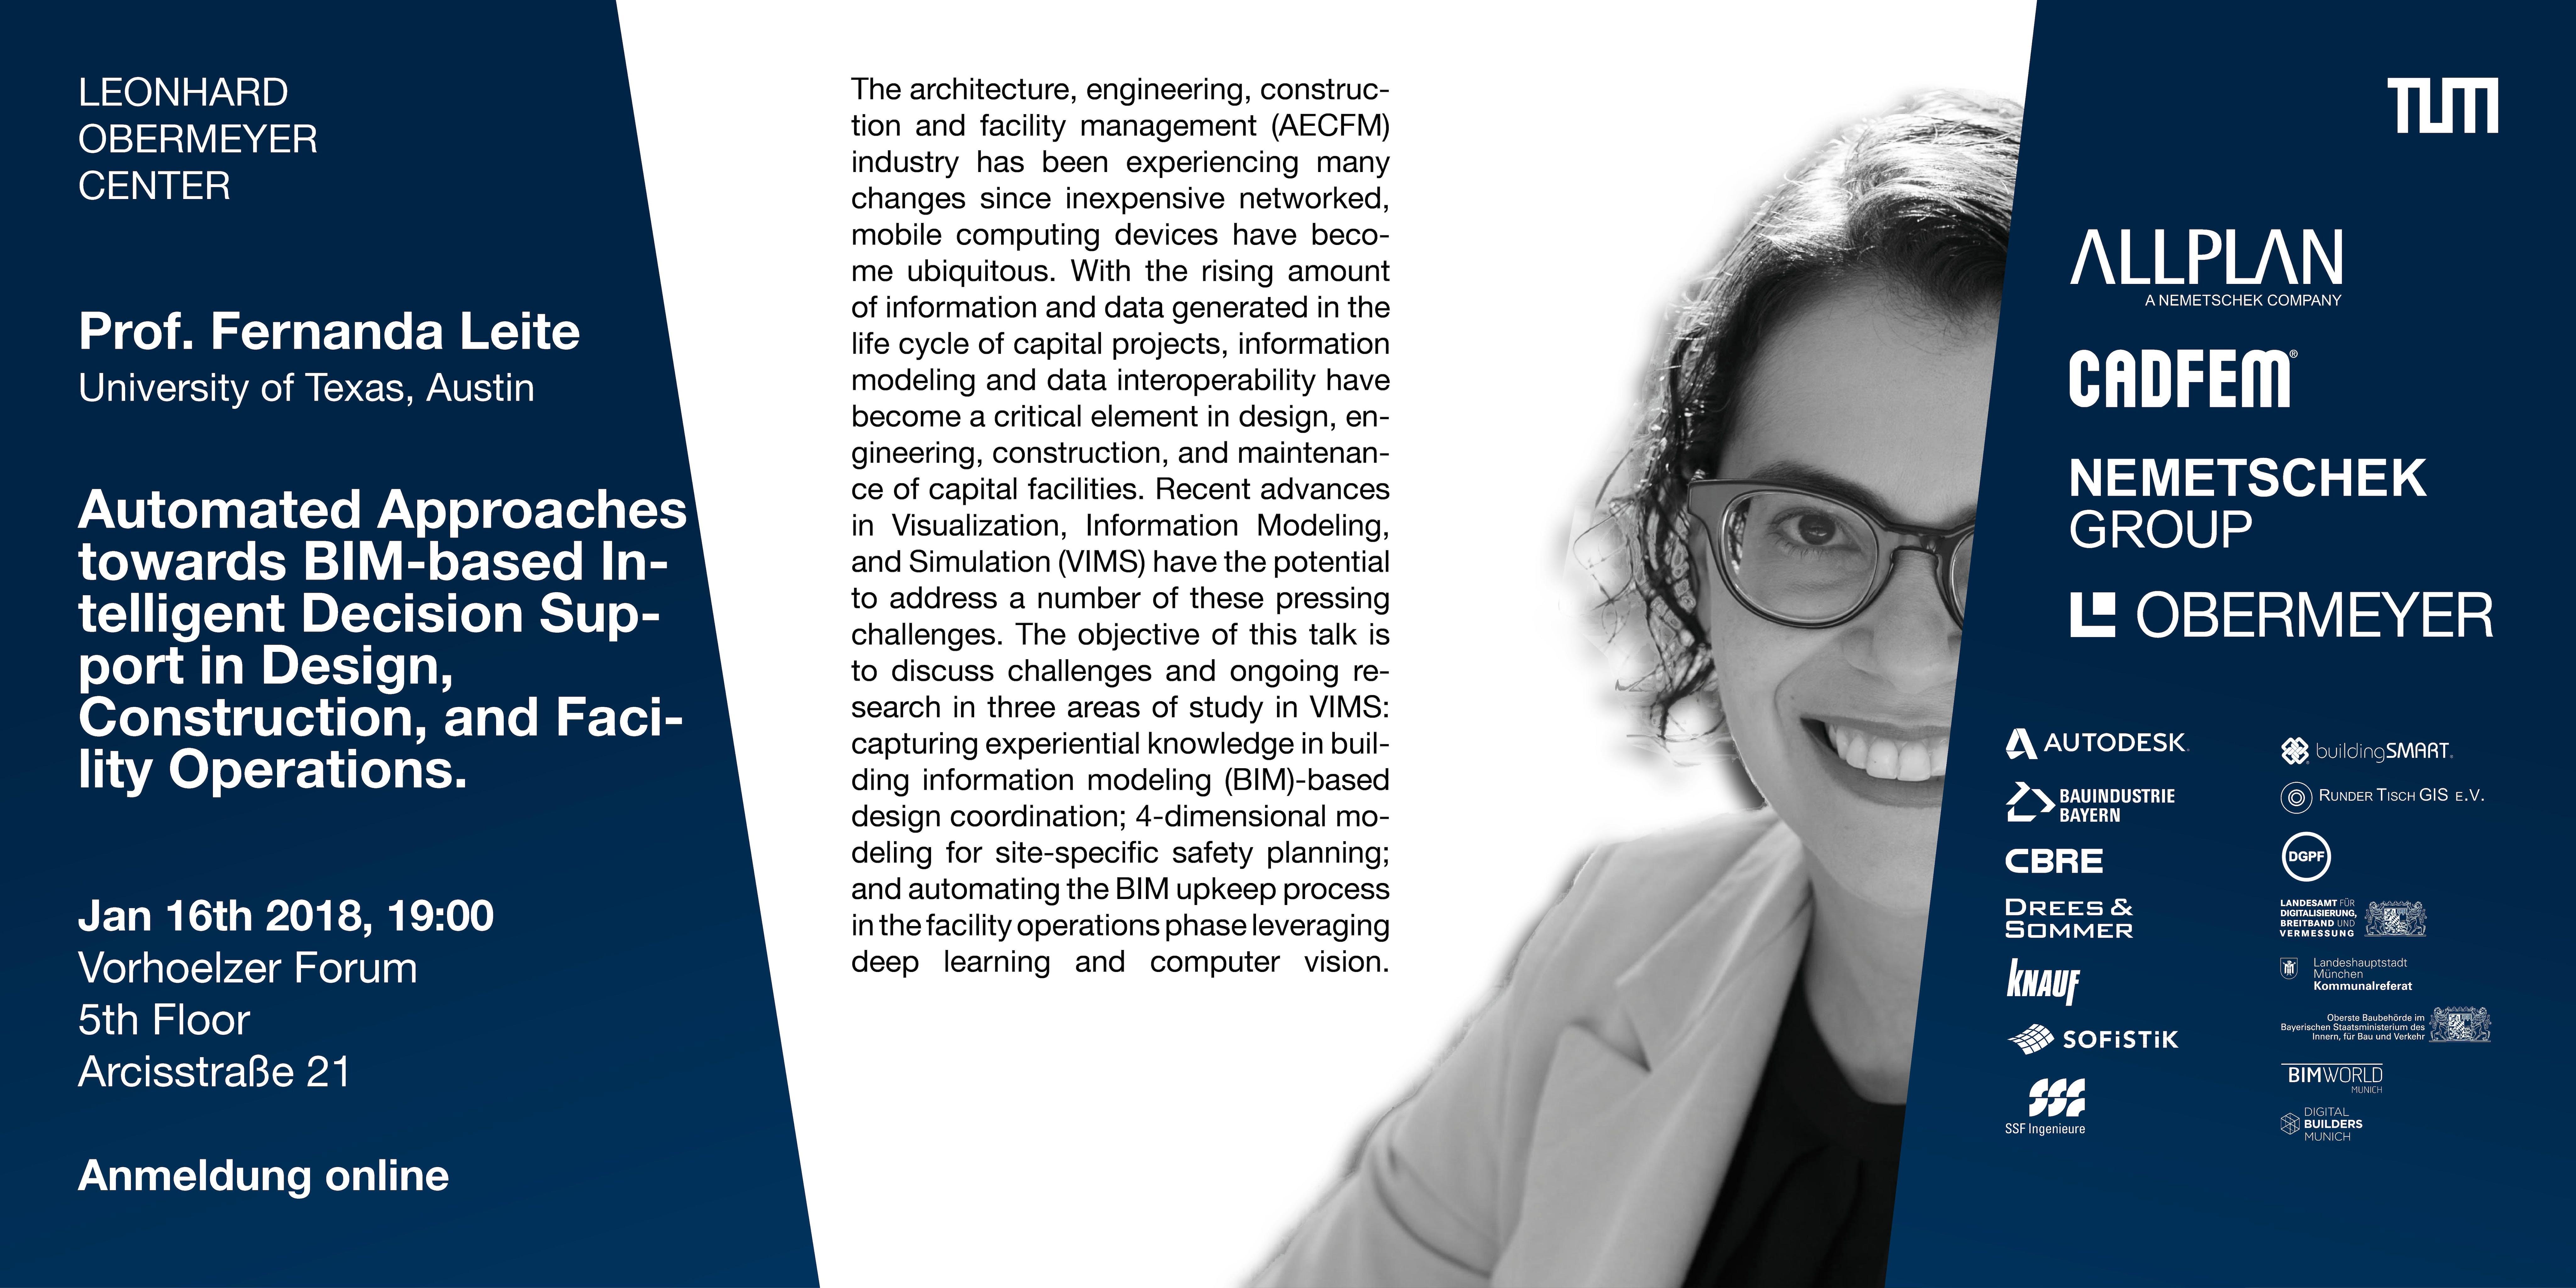 LOC Talk Prof. Fernanda Leite (University of